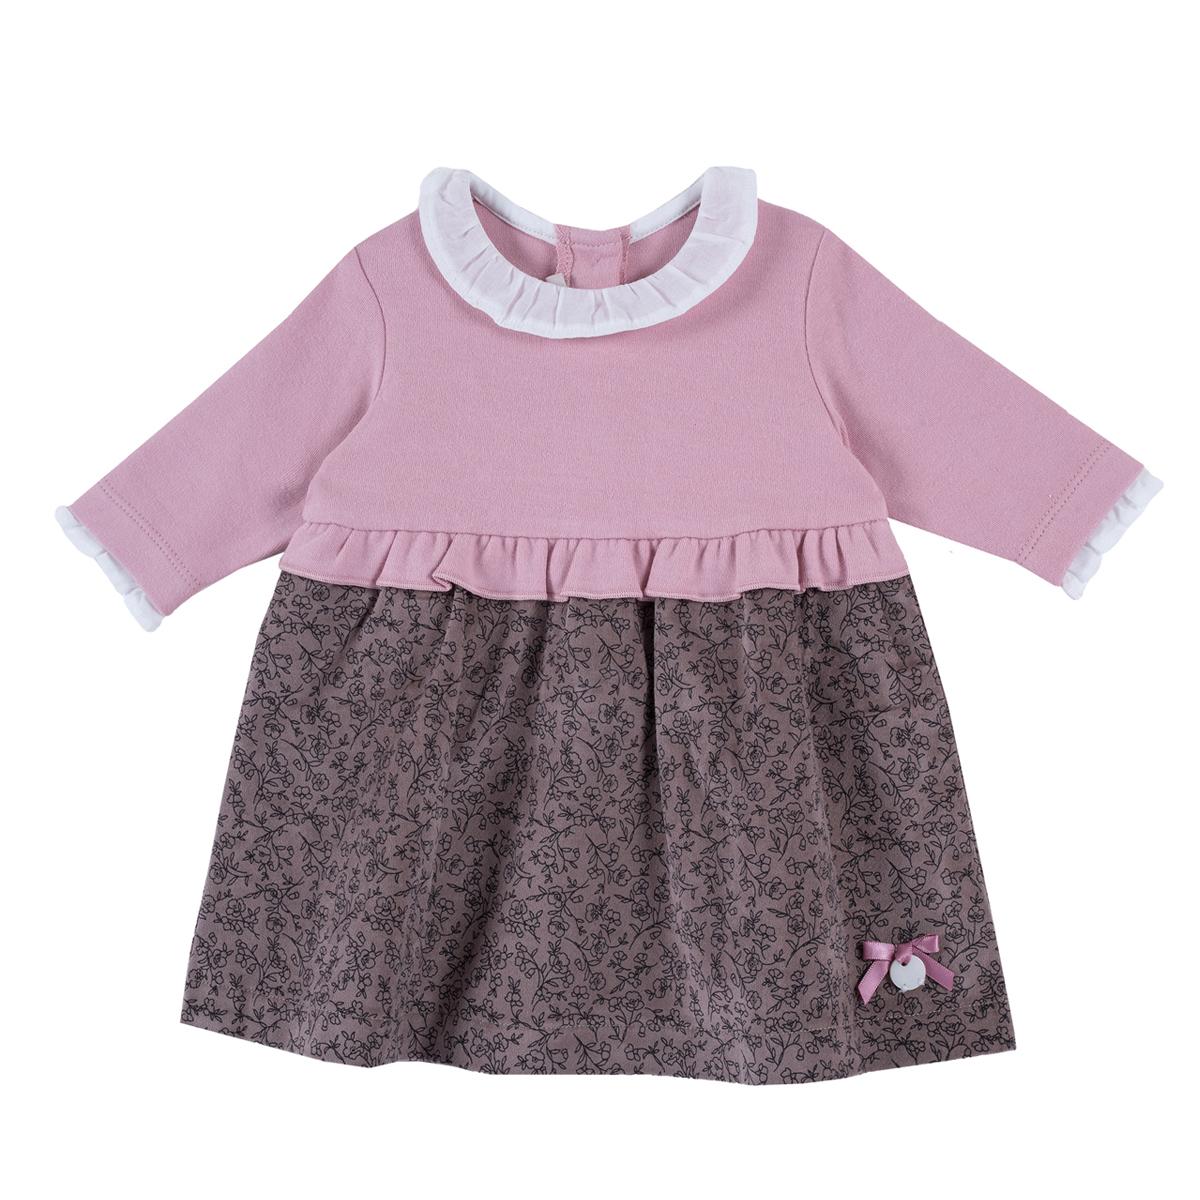 Rochie copii Chicco, maneca lunga, jerse si catifea, maro si corai, 03515 din categoria Rochii, Fuste